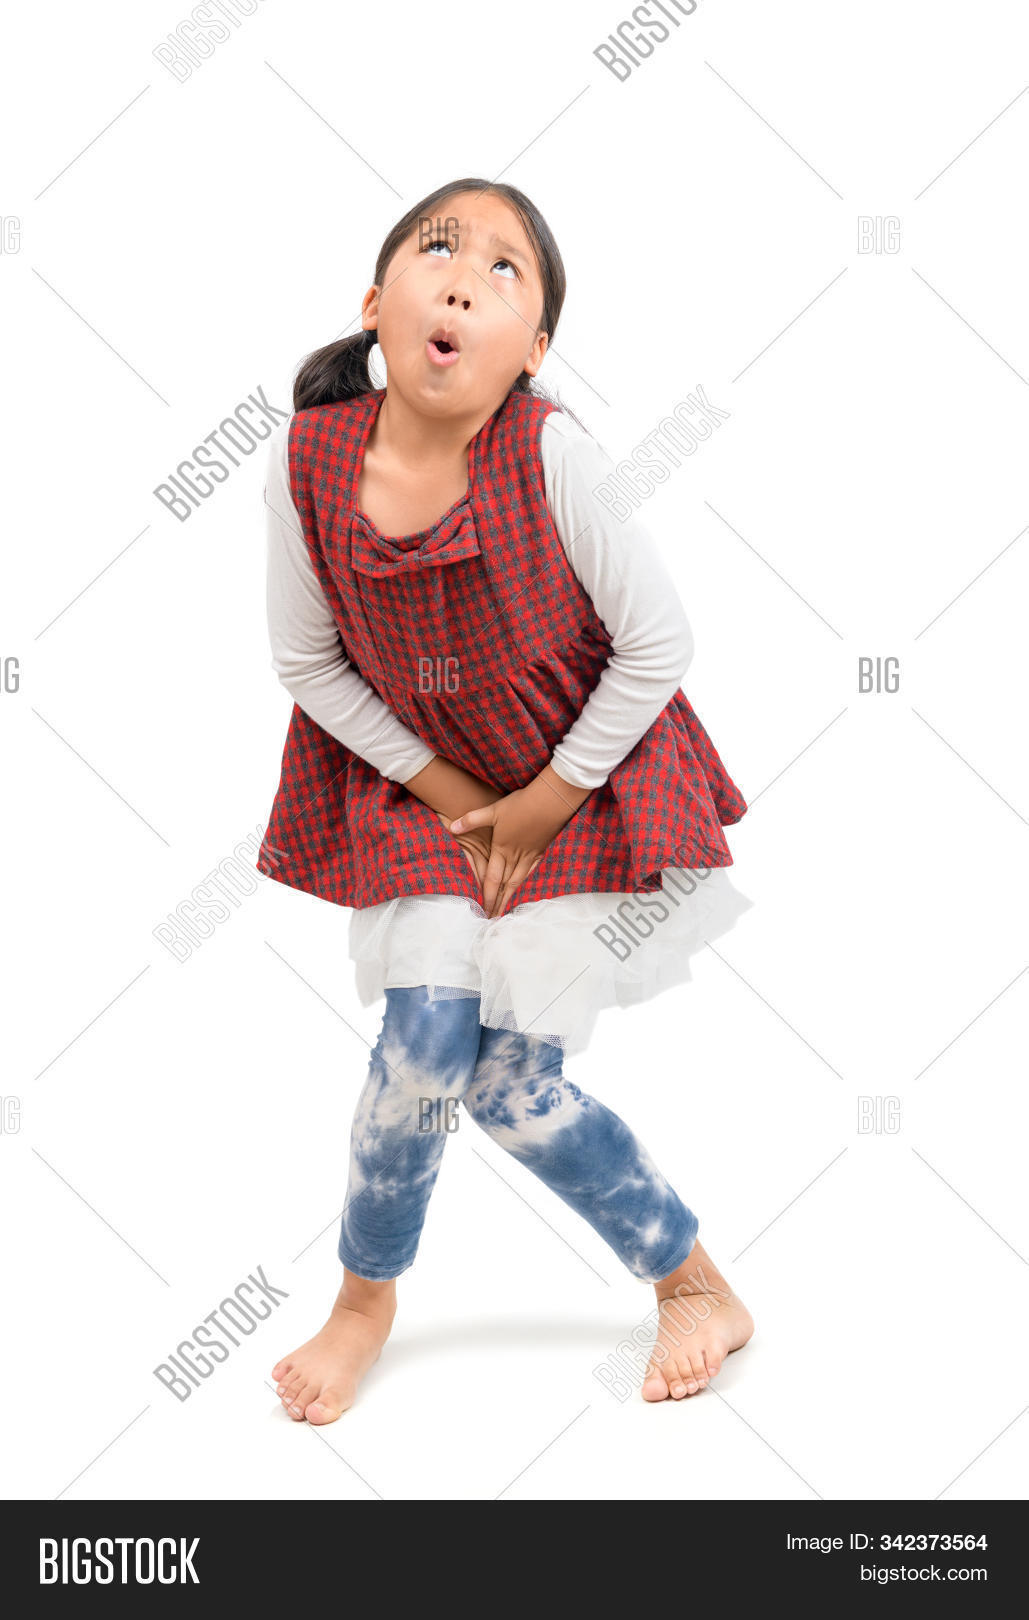 little girl pee 308 Little Girl Pee Photos - Free & Royalty-Free Stock ...